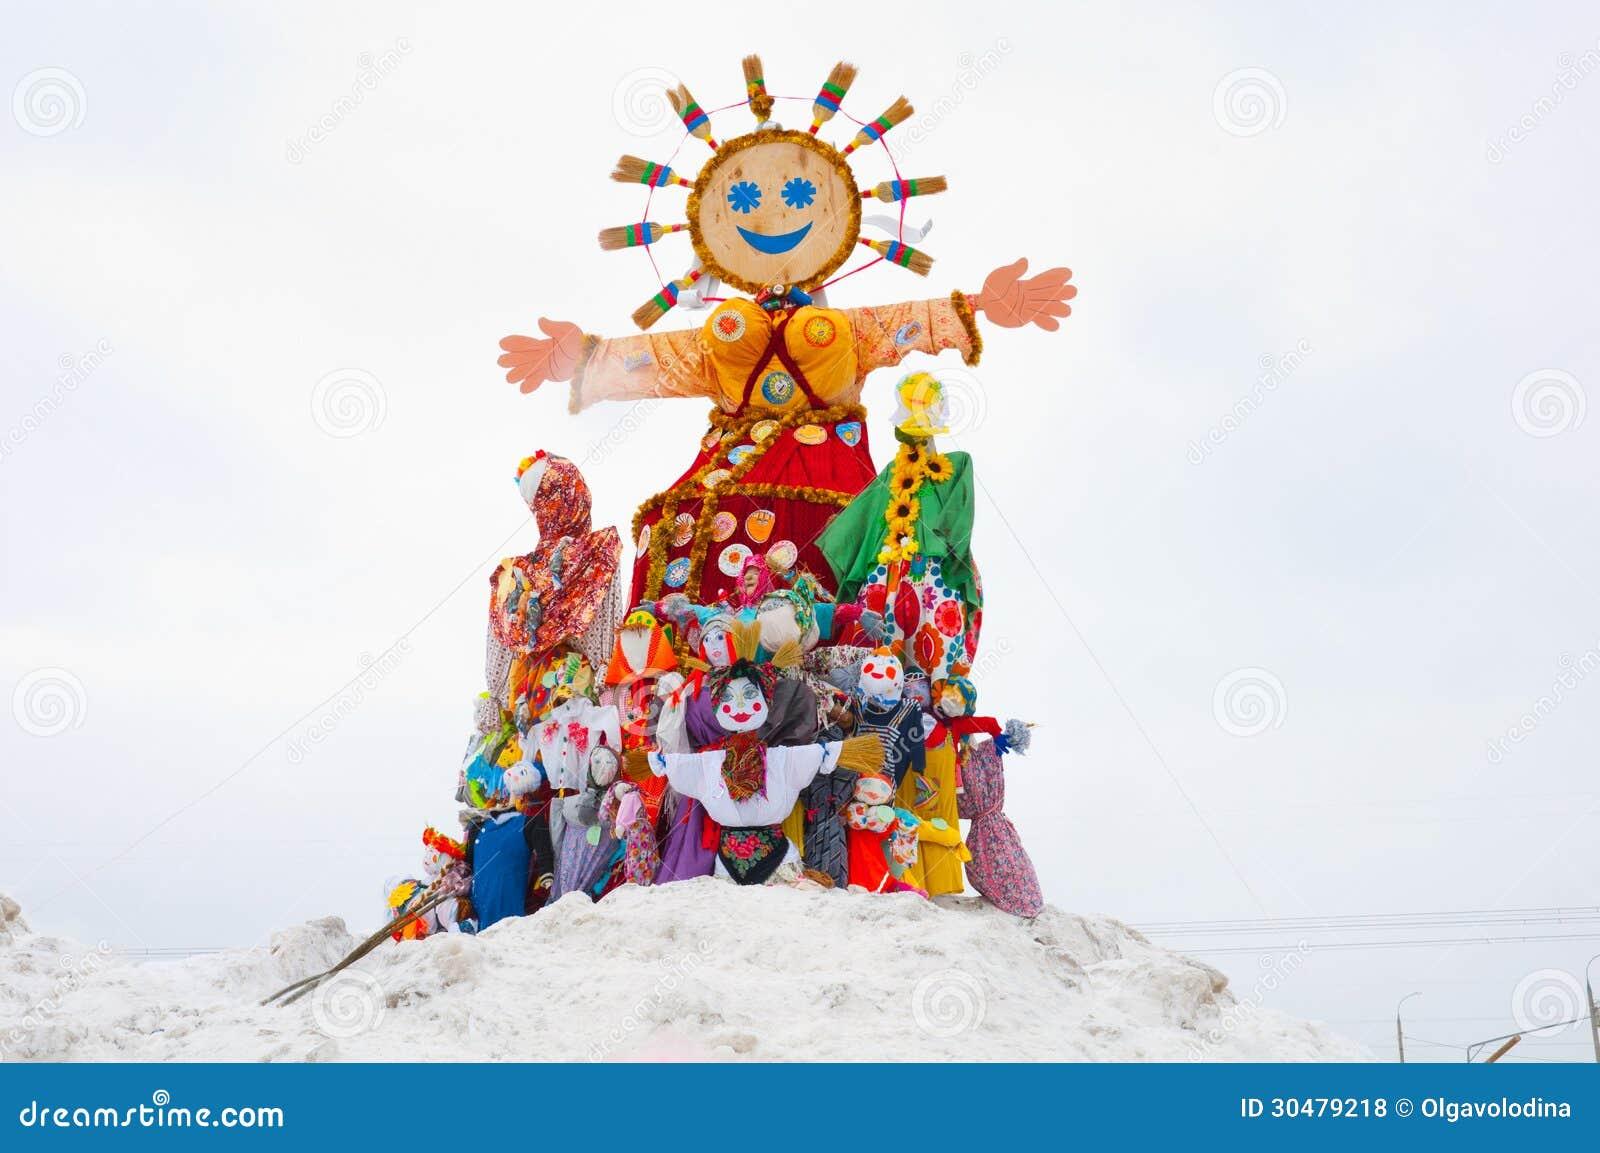 Maslenitsa - Russian Religious Holiday Stock Photo - Image of dolls ...